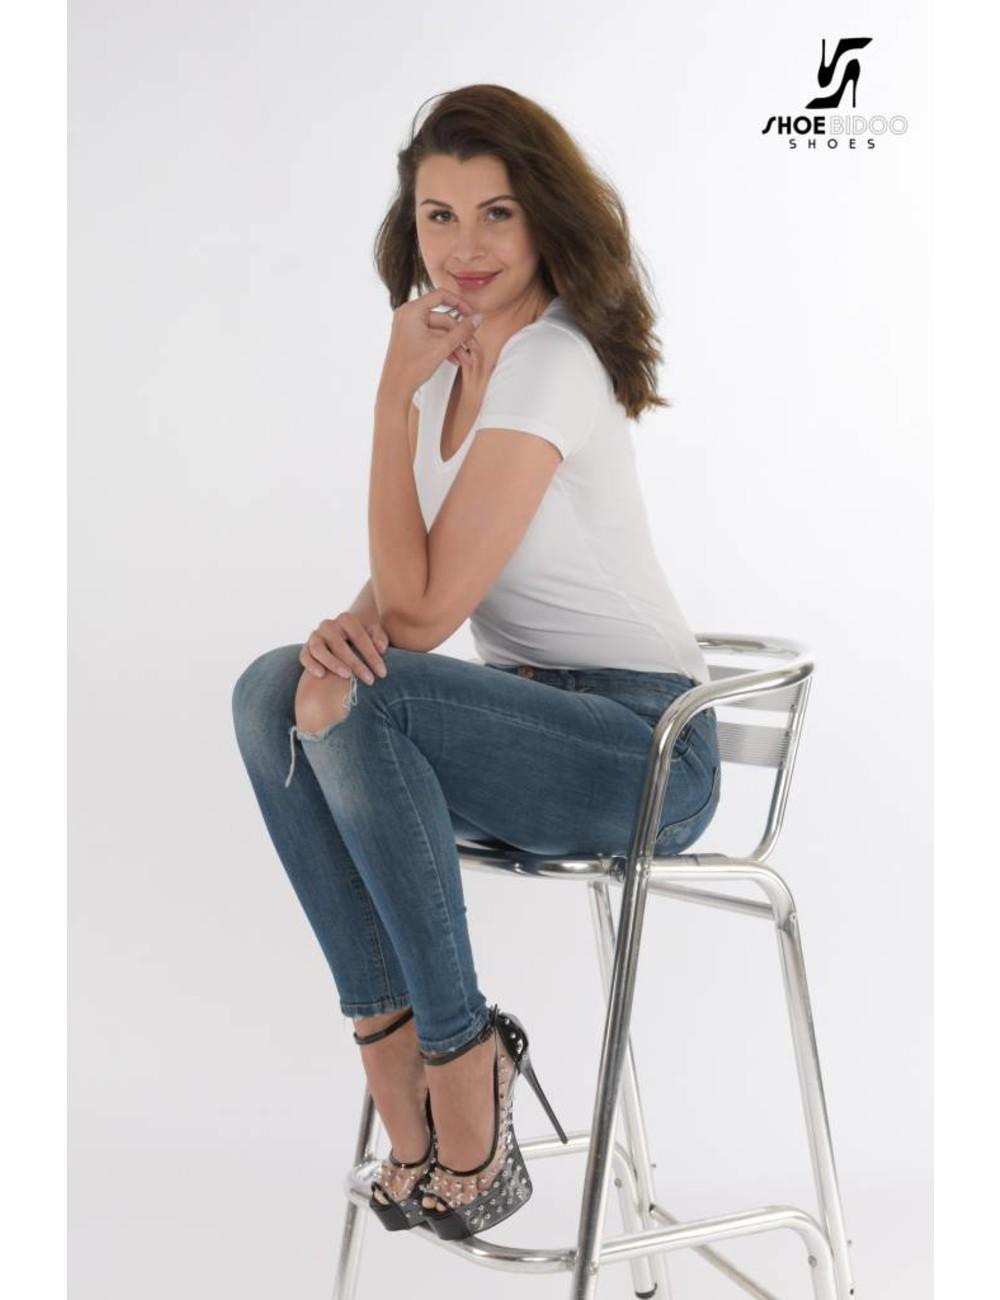 Giaro The power girl platform heels